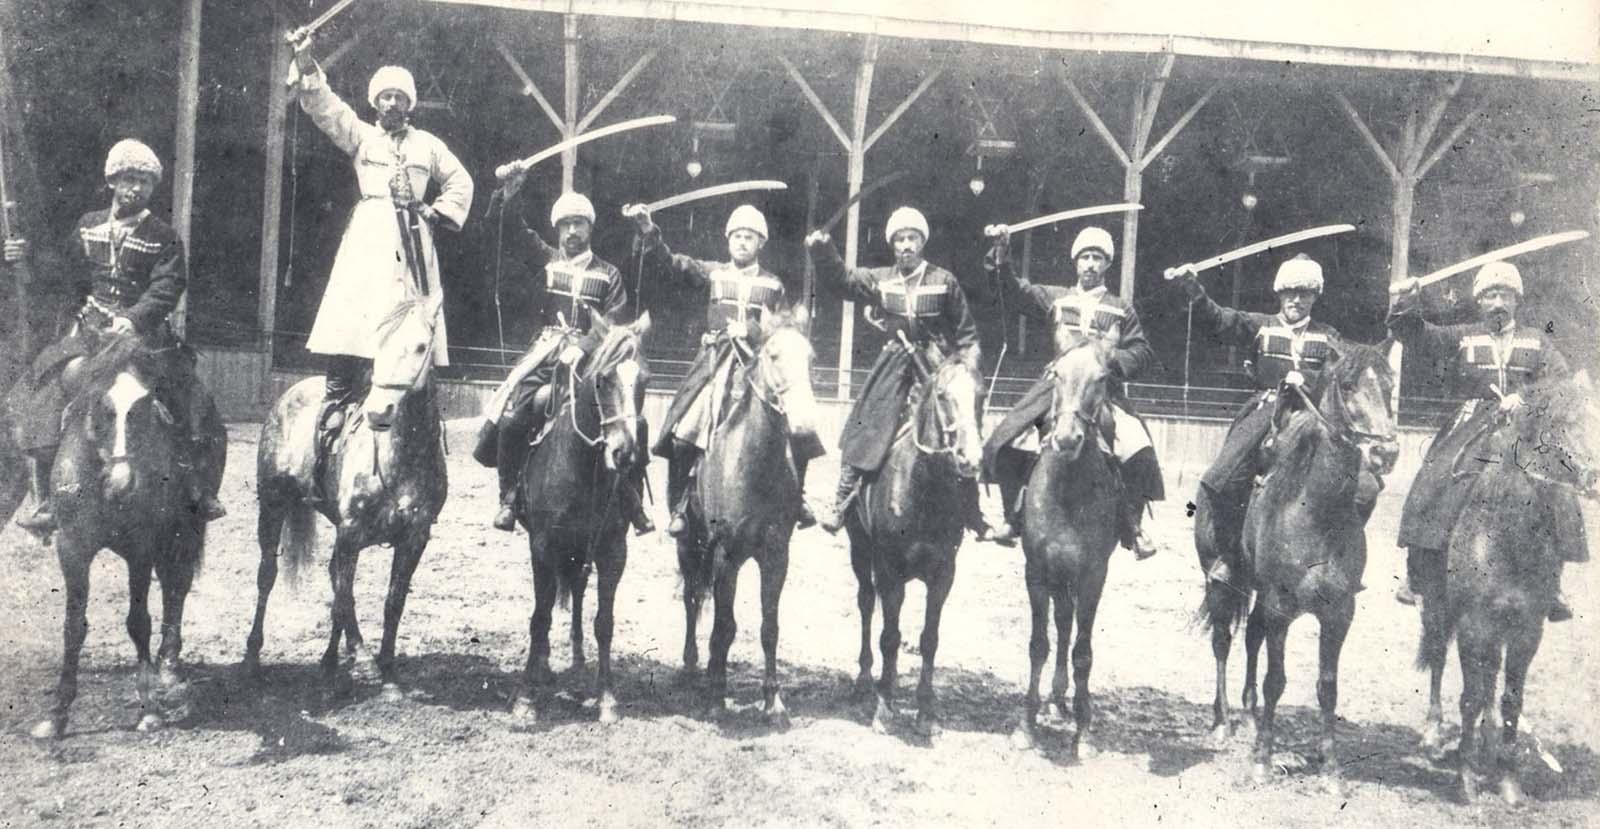 Georgian horsemen in England, circa 1903. Standing on the horse, in white chokha, Luka Chkhartishvili. Collection of Irakli Makharadze.